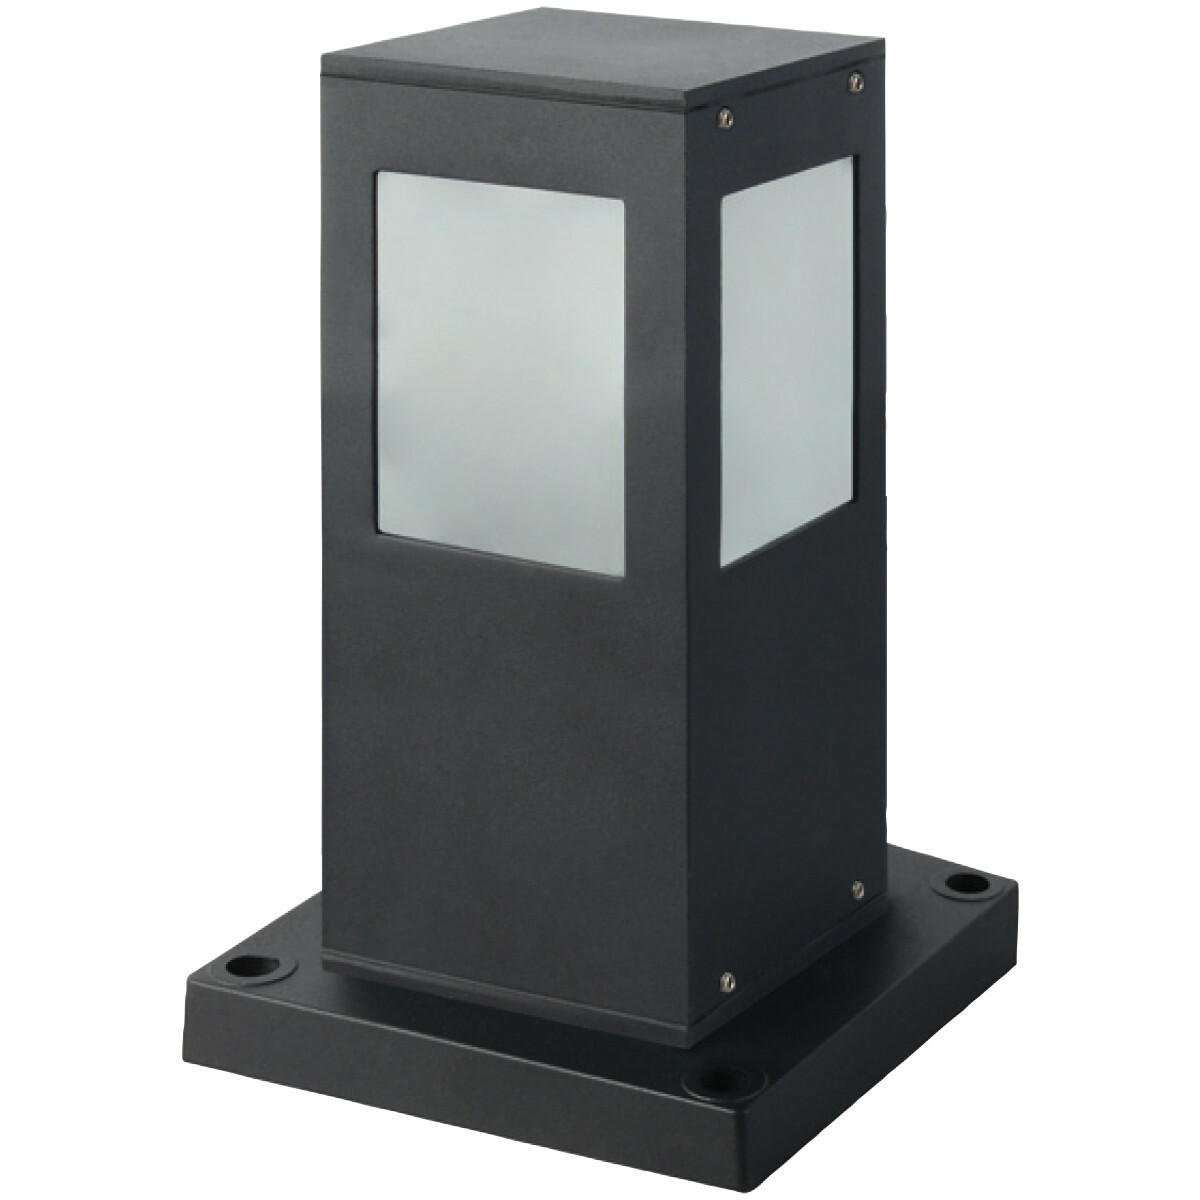 PHILIPS - LED Tuinverlichting - Staande Buitenlamp - CorePro Lustre 827 P45 FR - Kavy 3 - E27 Fittin